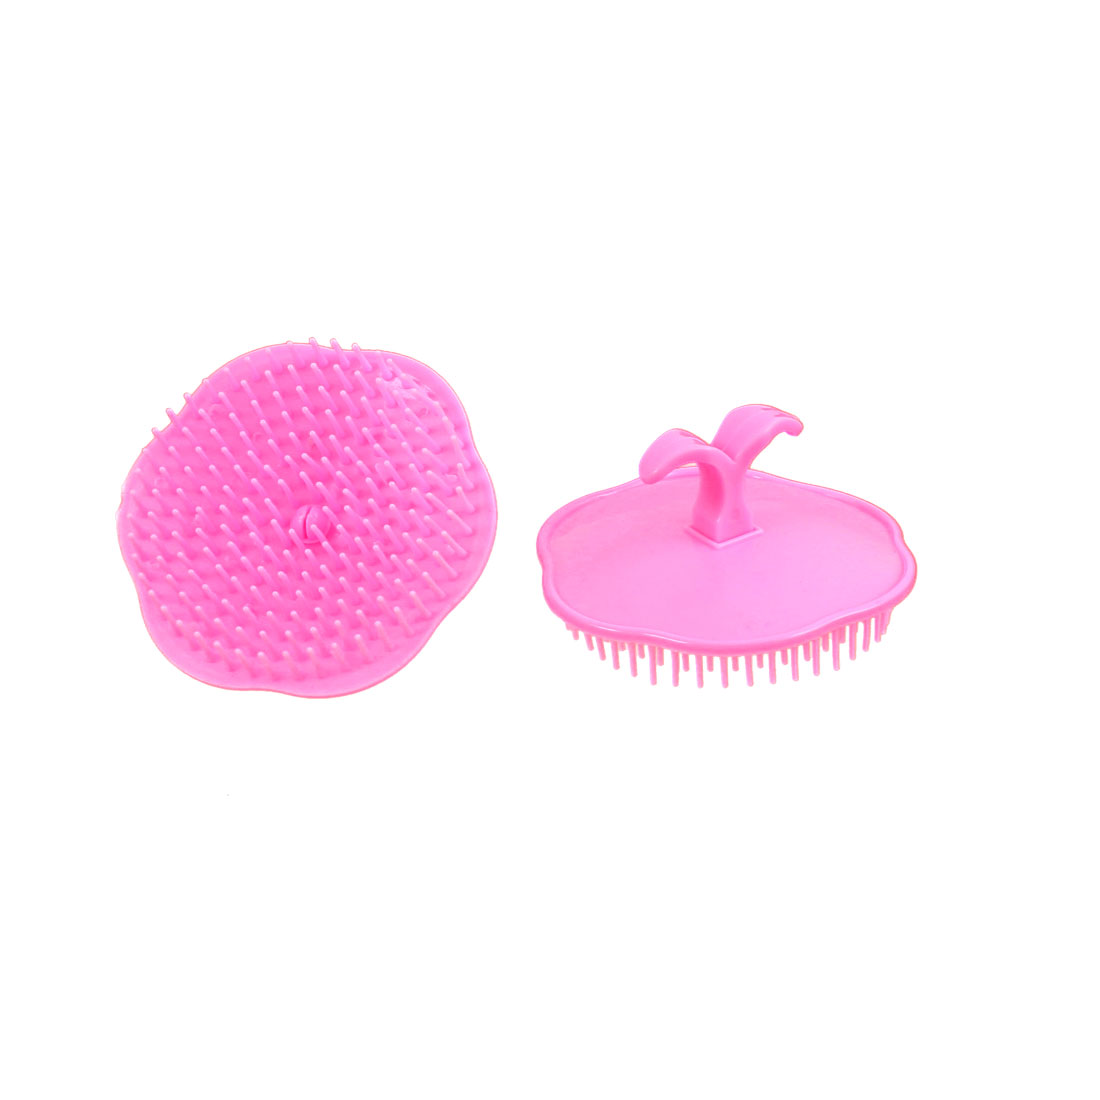 Hair Scalp Body Massage Comb Shampoo Brush Head Conditioner Pink 2Pcs